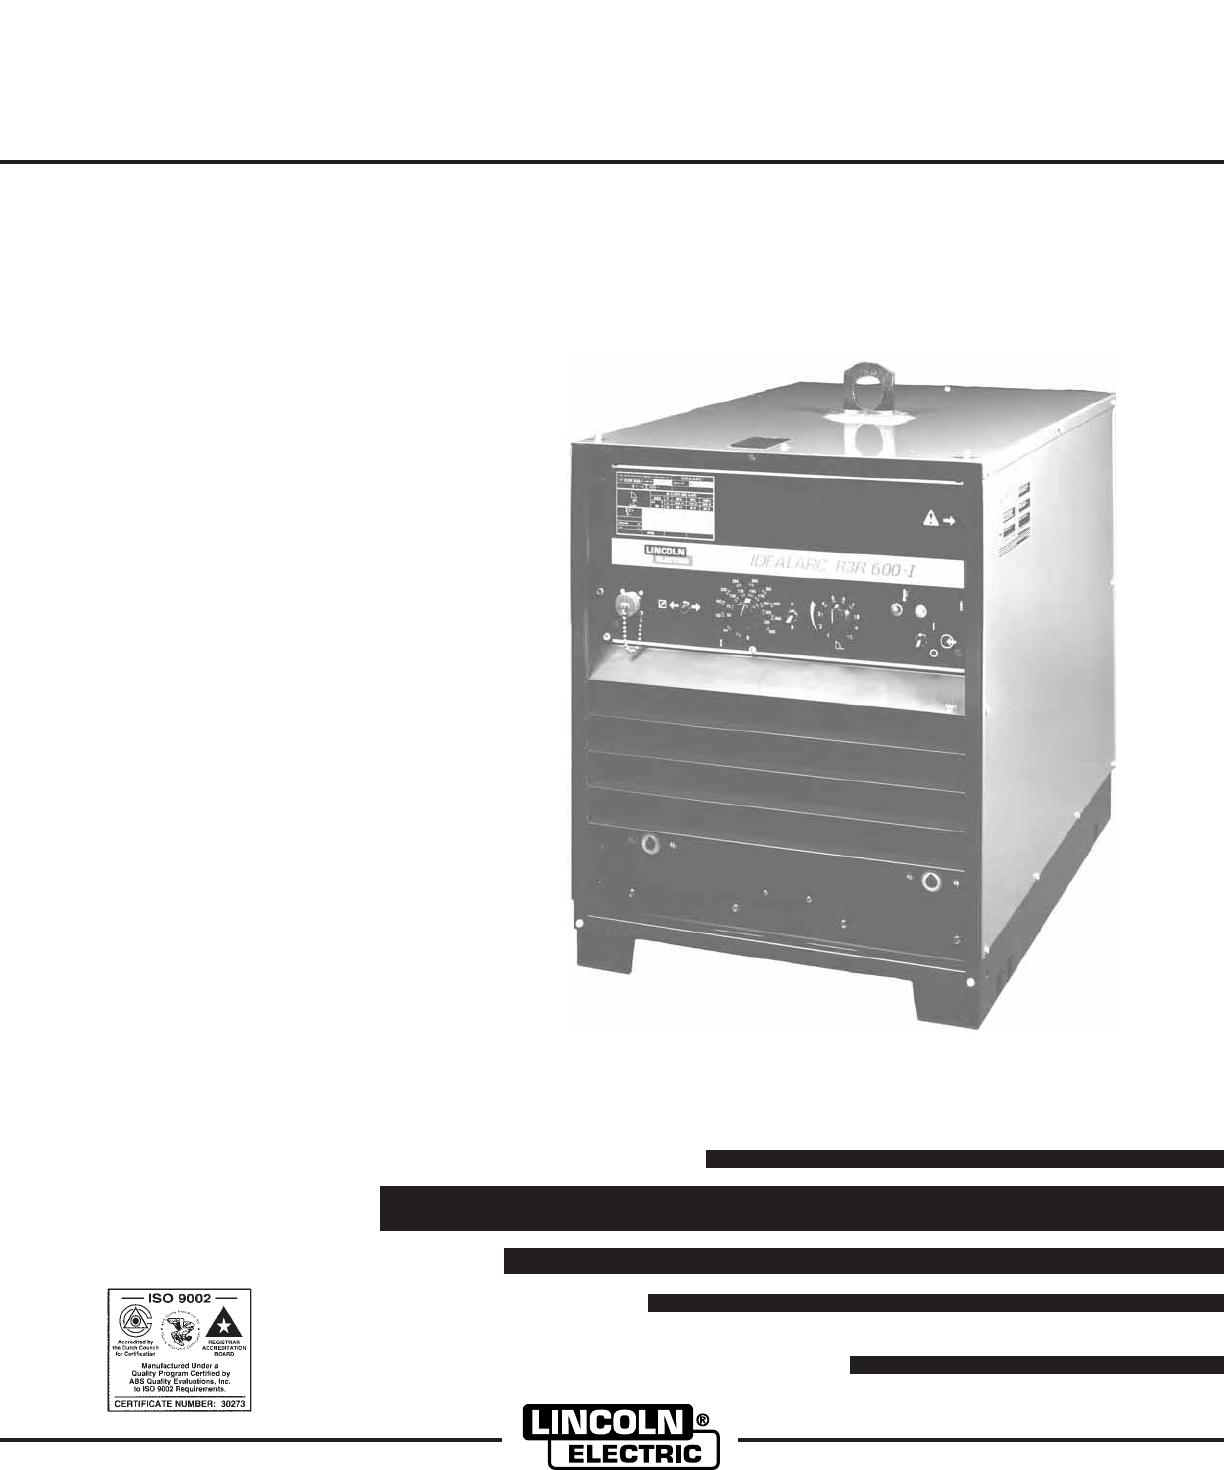 Lincoln Electric Idealarc R3r 600 I Users Manual Im885 250 Wiring Diagram